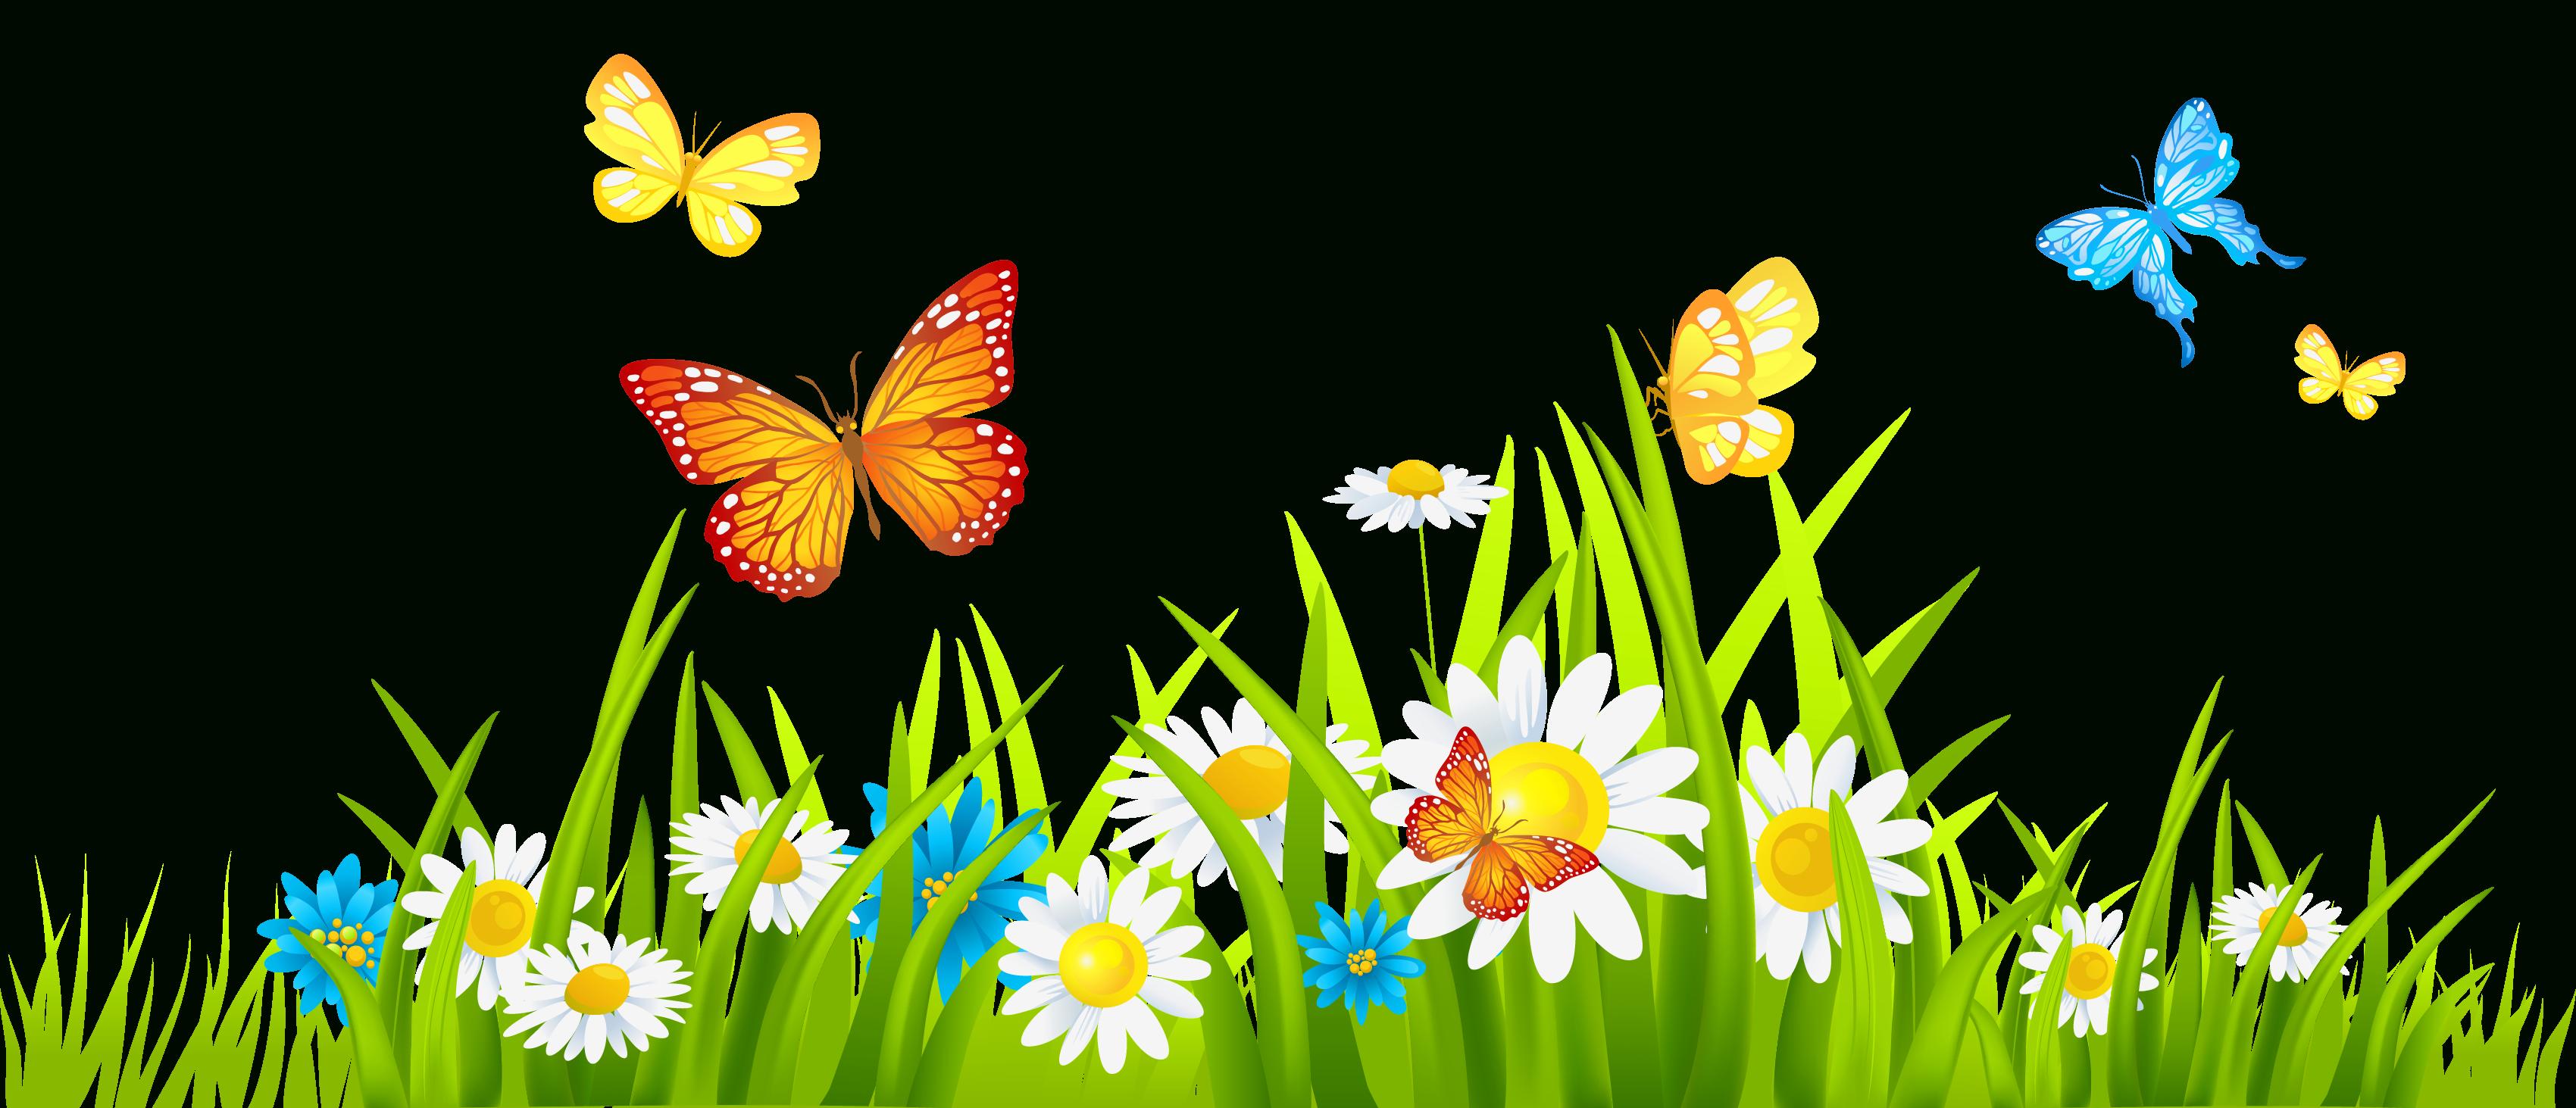 Flower garden clipart free clip art transparent download Wonderful Of Flower Garden Clipart Png   Letters Format clip art transparent download